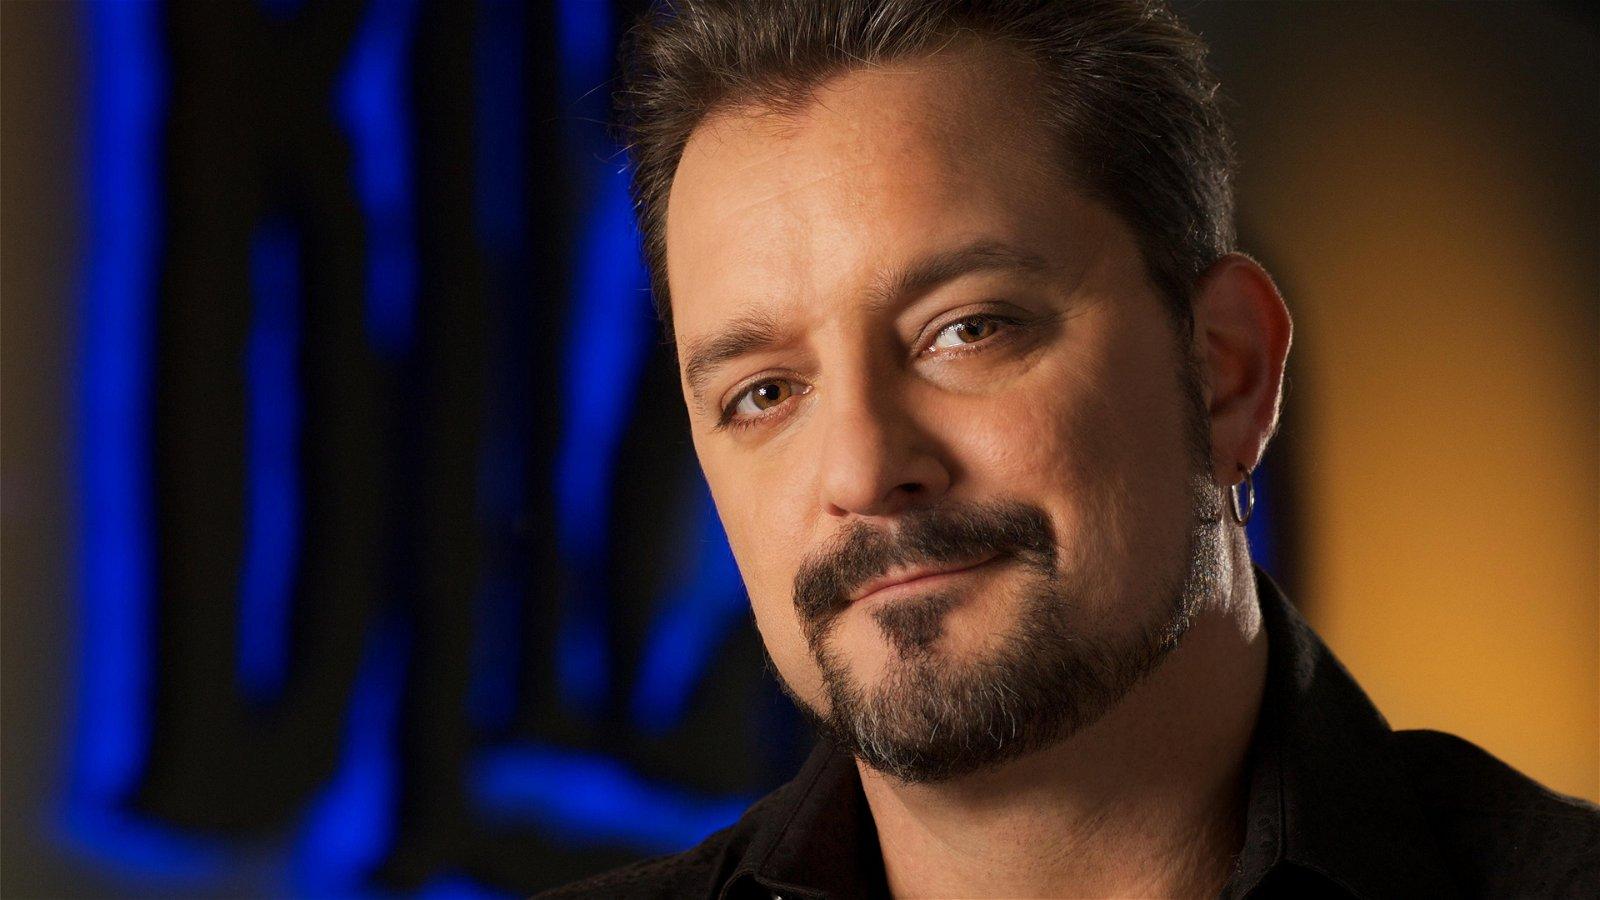 Blizzard Veteran Chris Metzen Announces Retirement